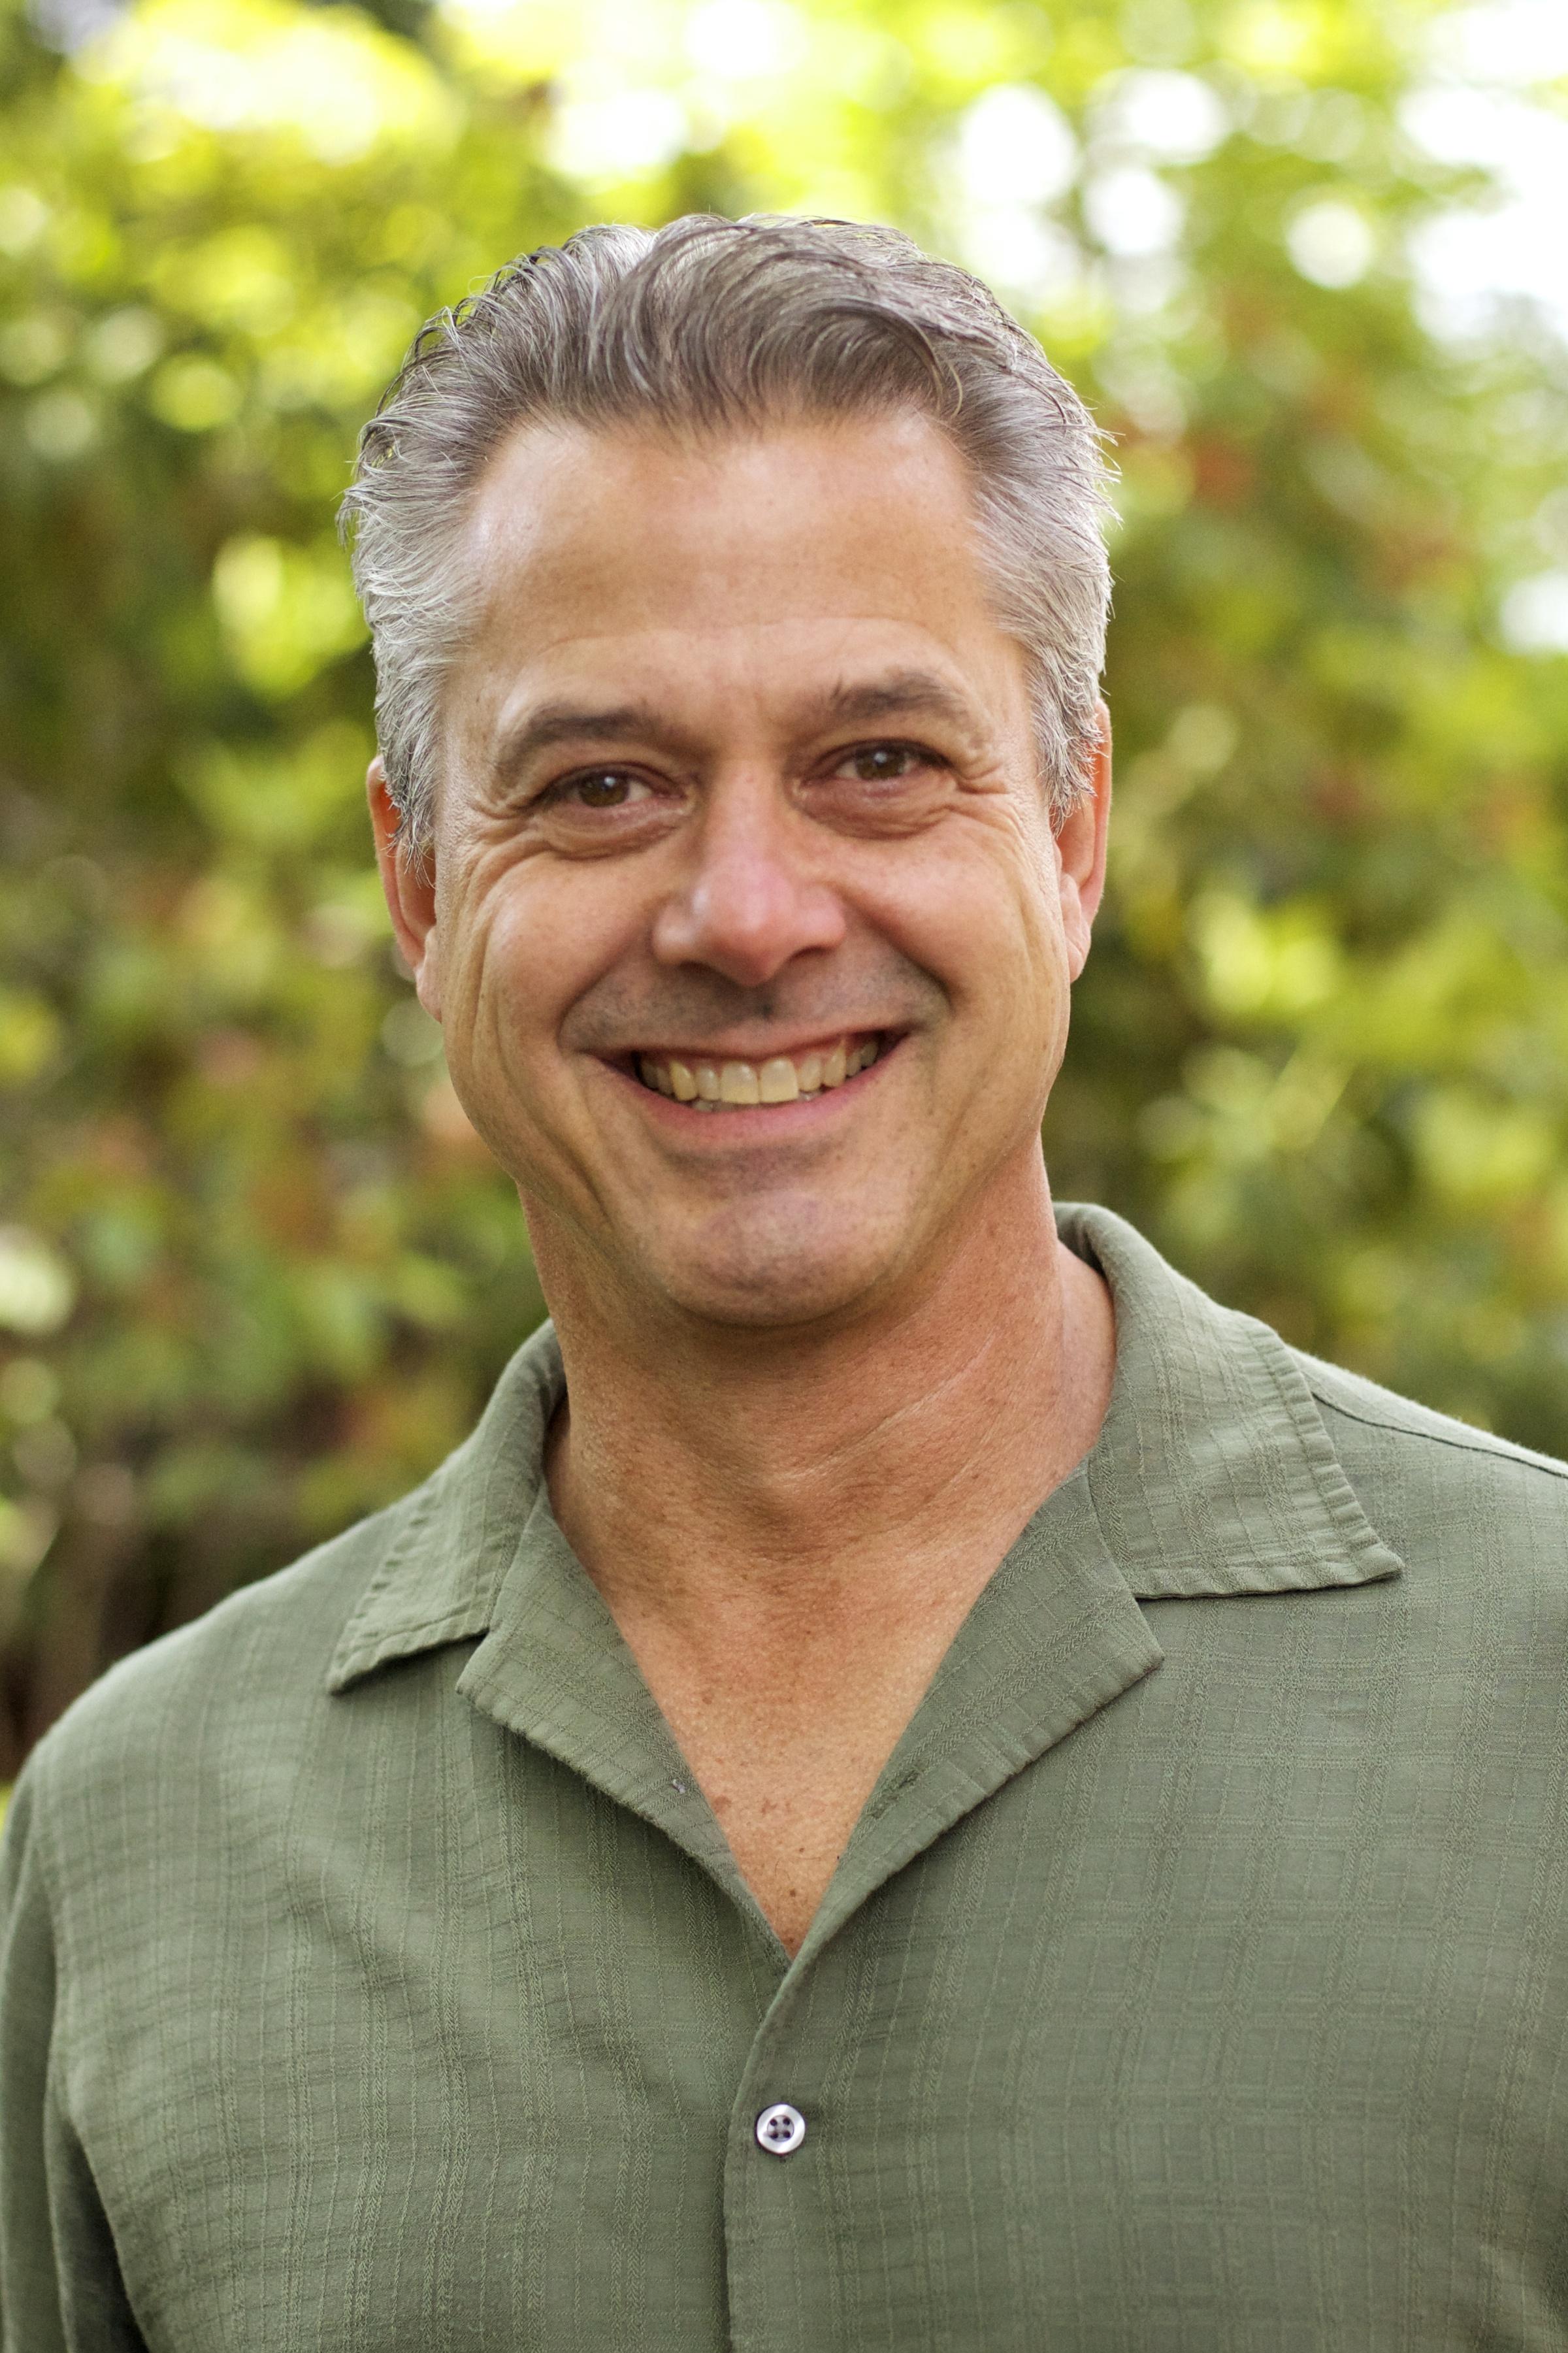 Jeff Roth, MA, LMHC